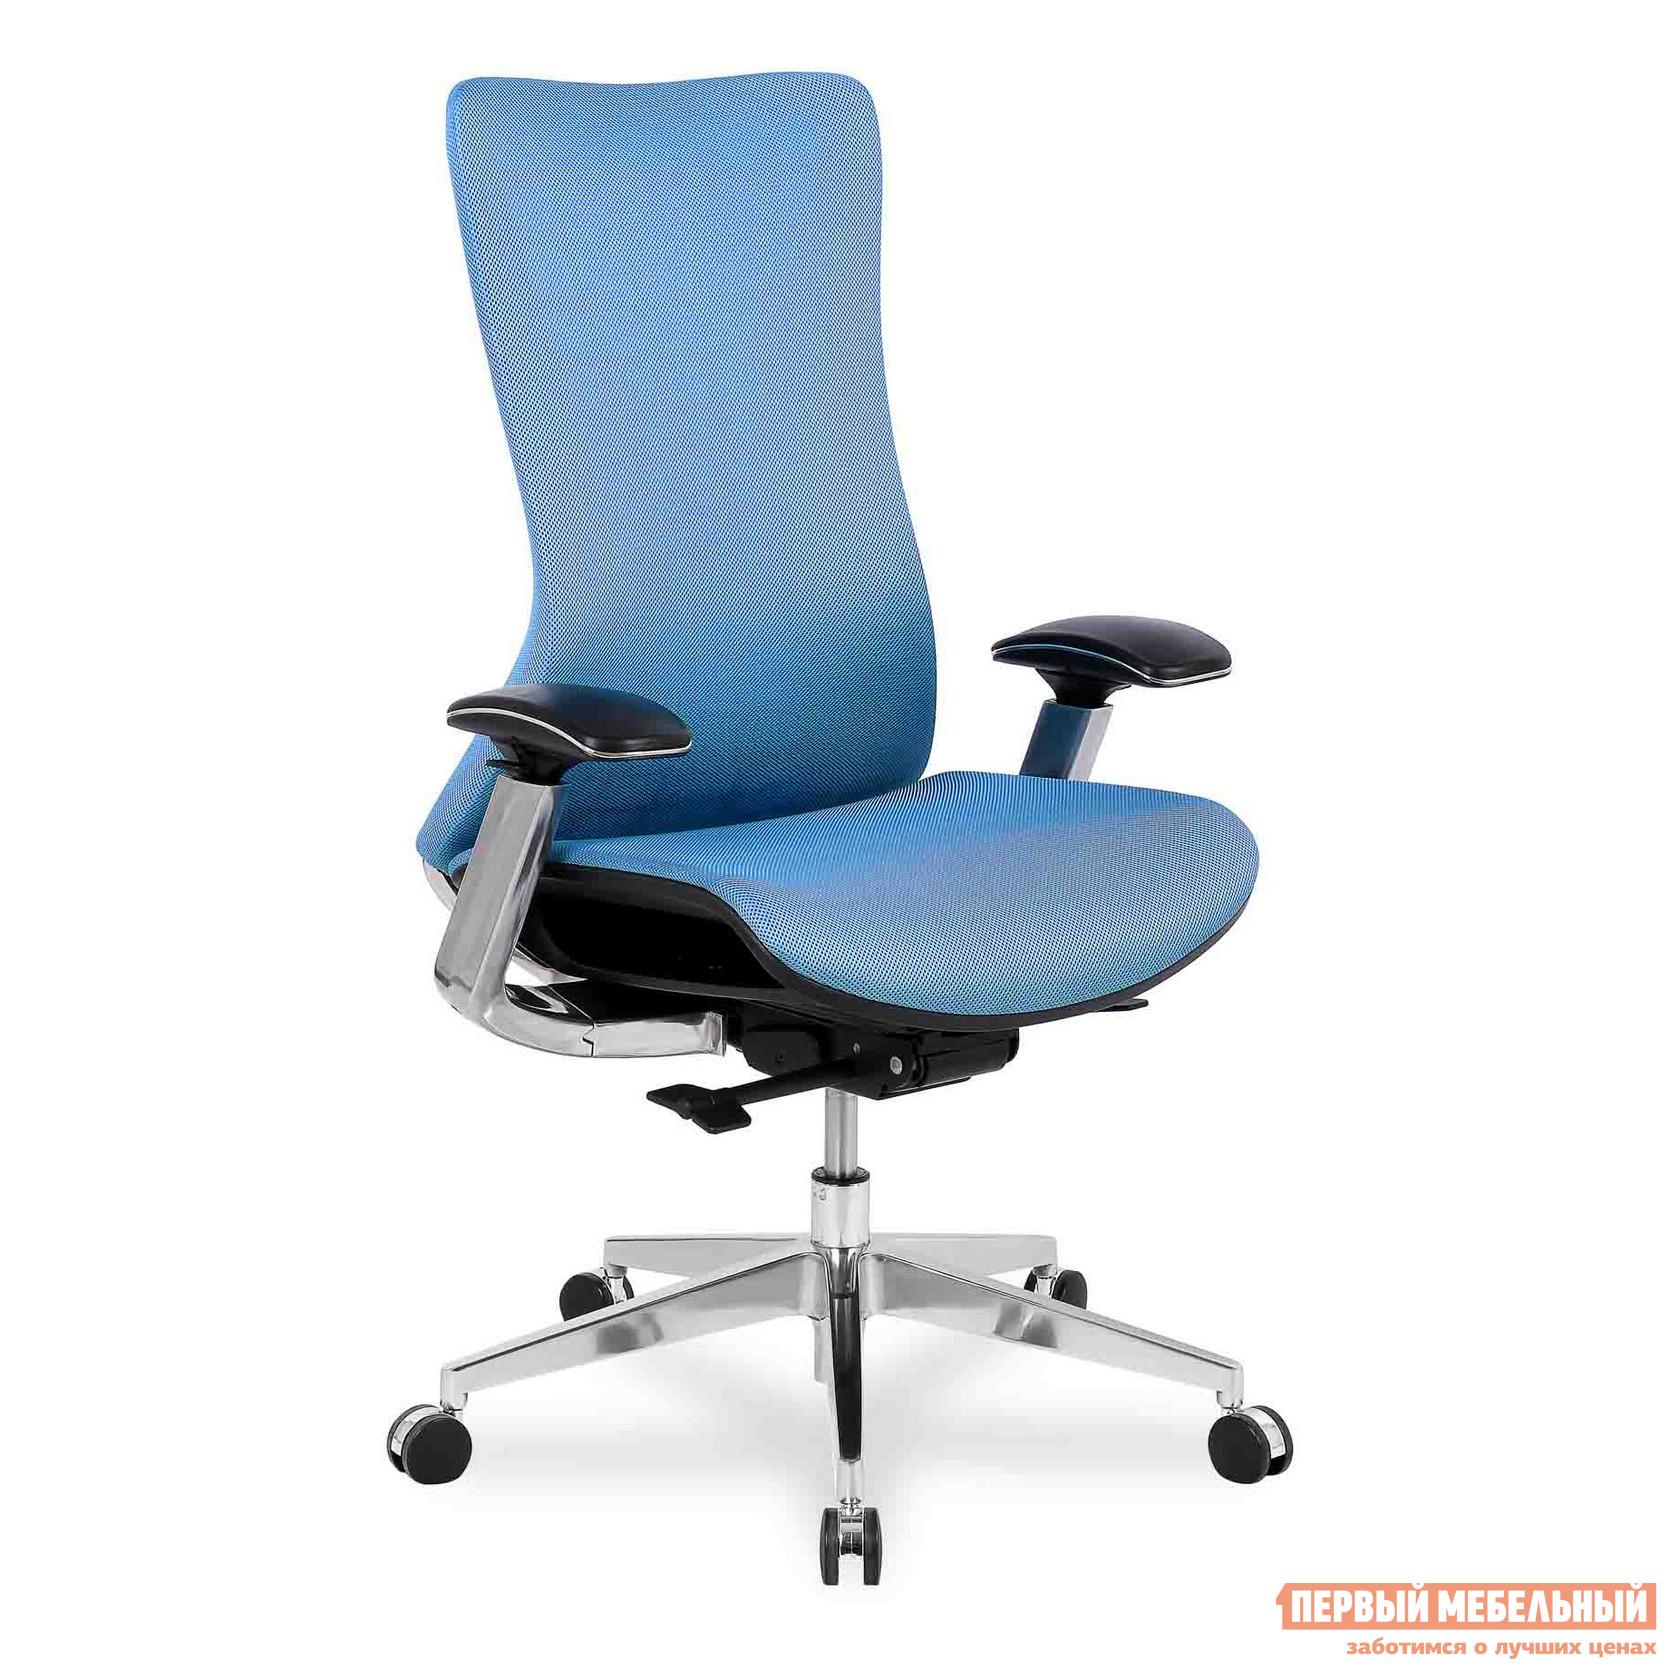 Офисное кресло College Кресло HLC-2588F кресло офисное college h 8369f